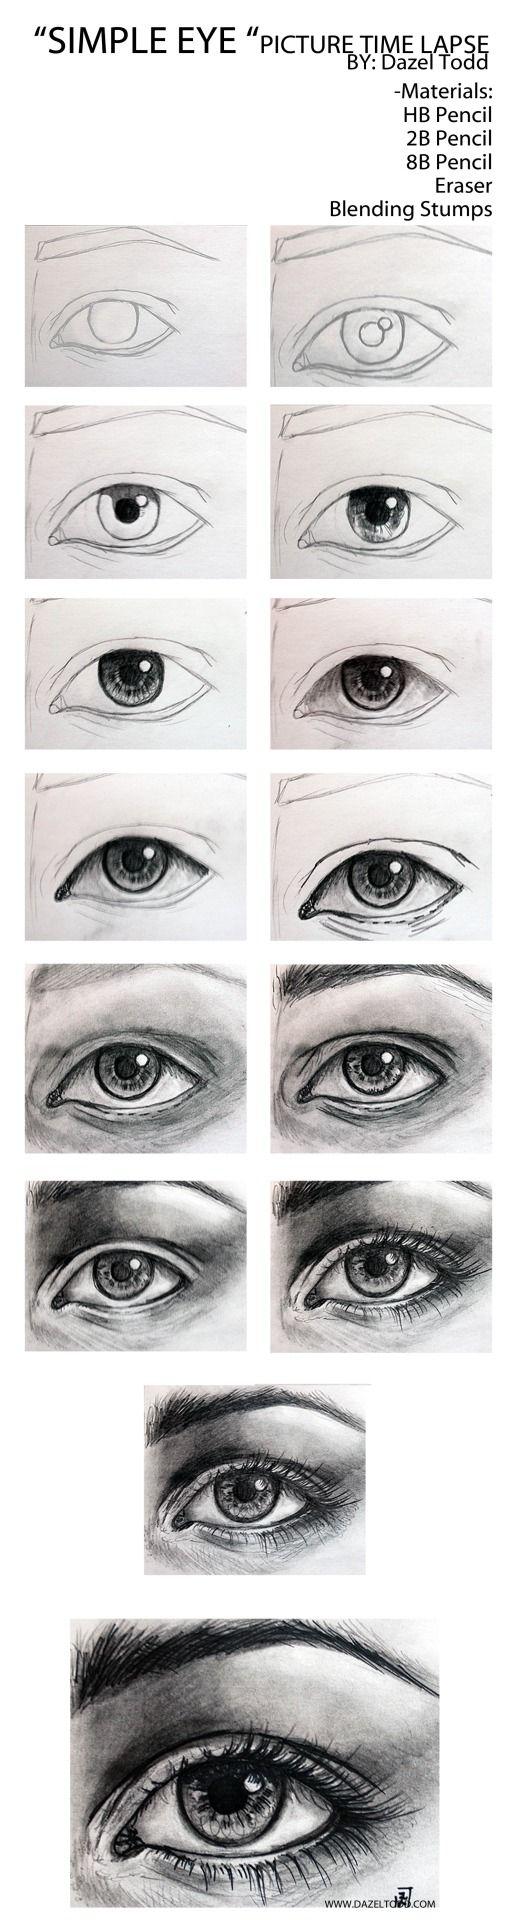 DazelTodd — Hey guys , Here is a time lapse of an #eye I #drew...